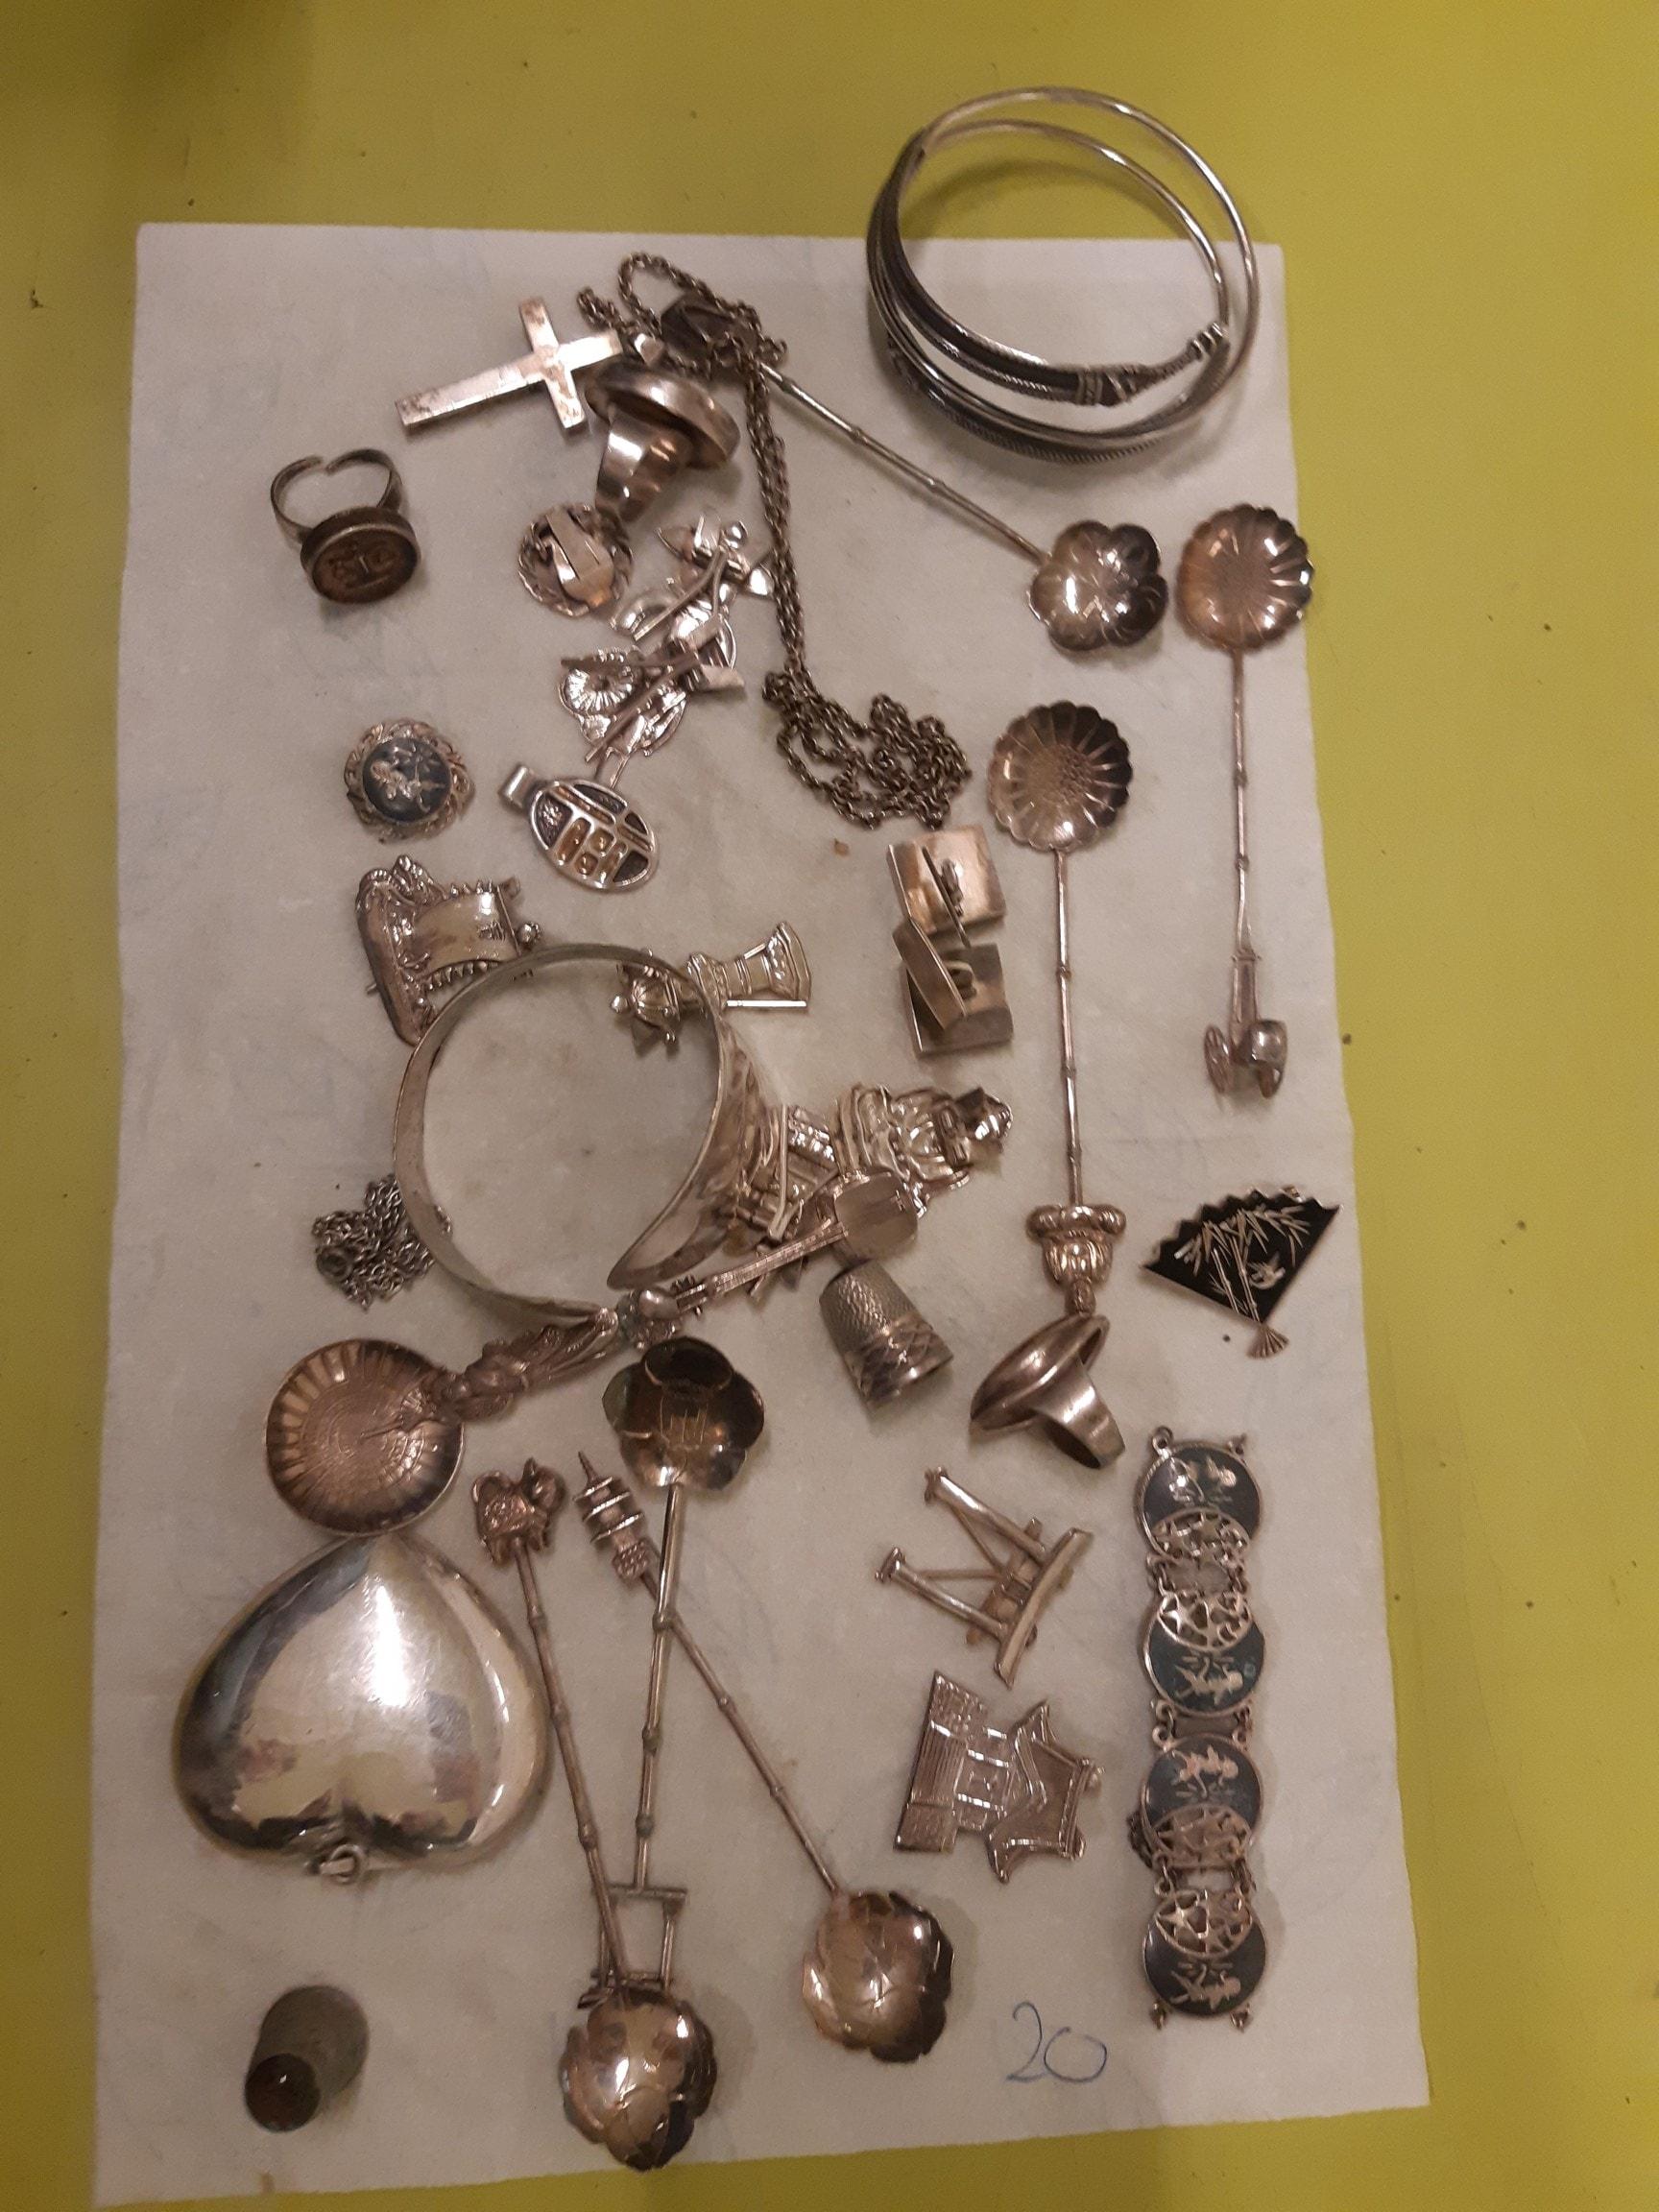 Bestik, smykker og sølvgenstande fundet i Boserup Skov, Roskilde